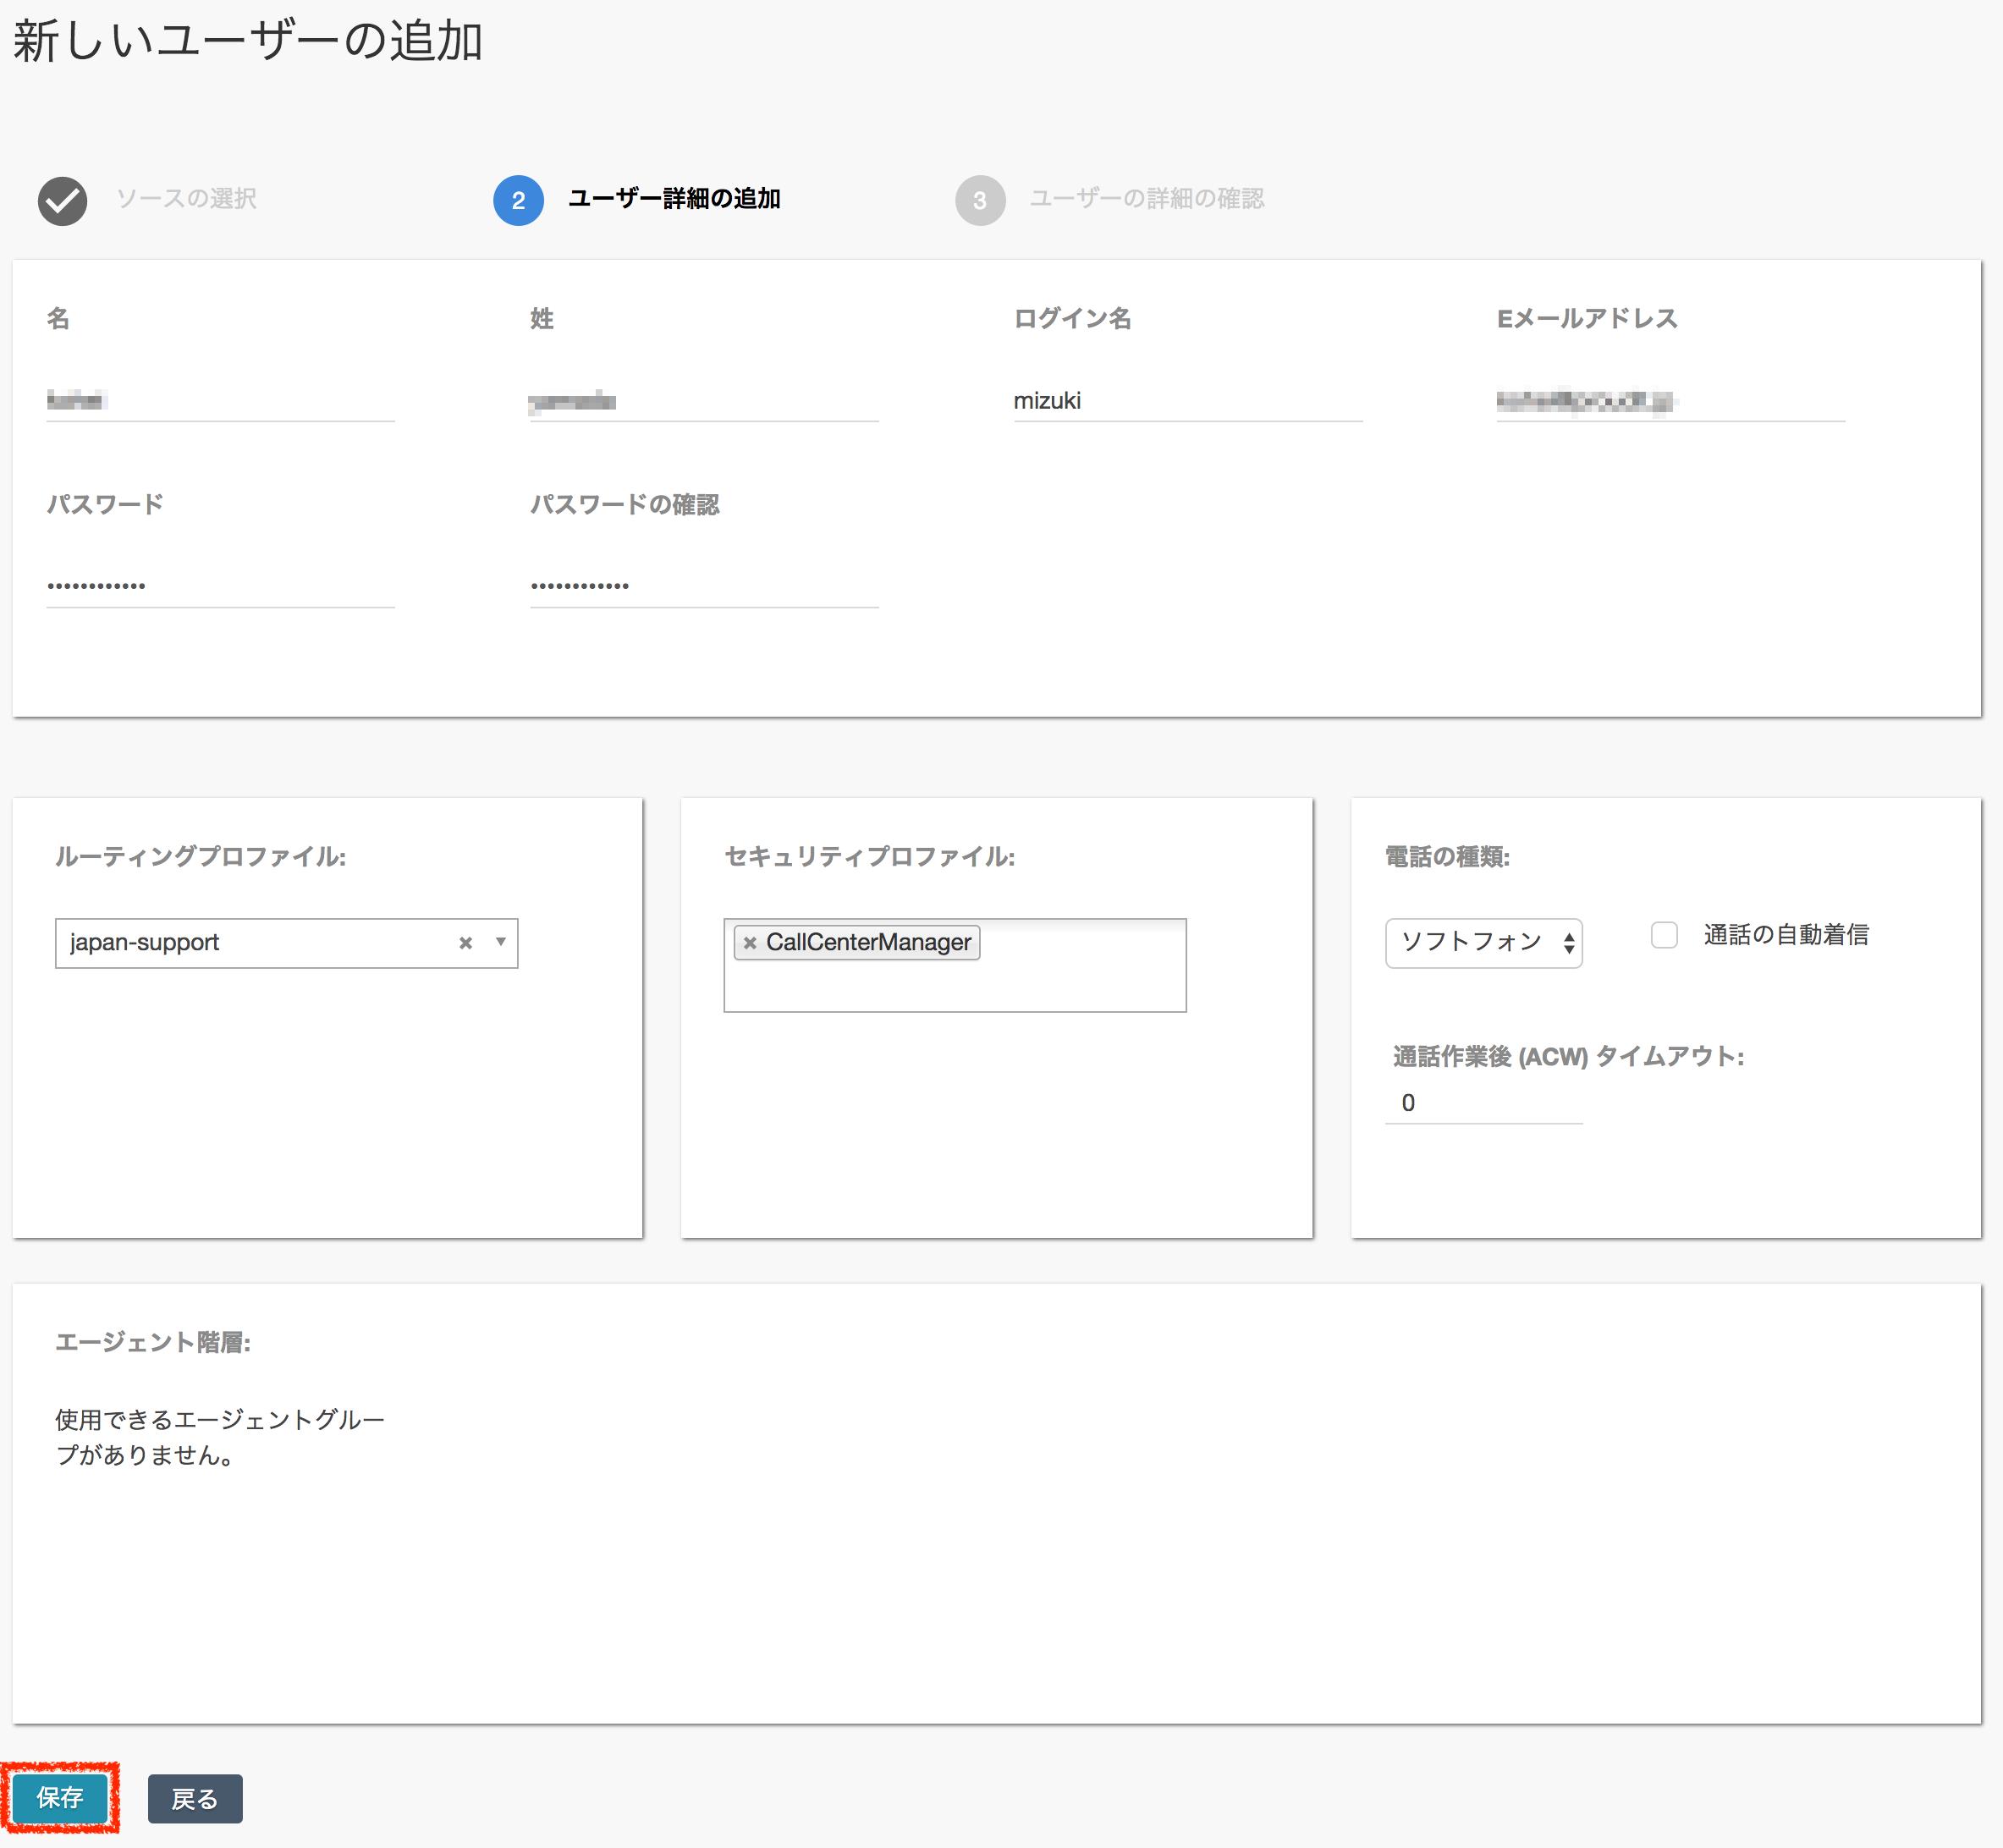 screencapture-kooooohei-awsapps-connect-users-1517274167160.png